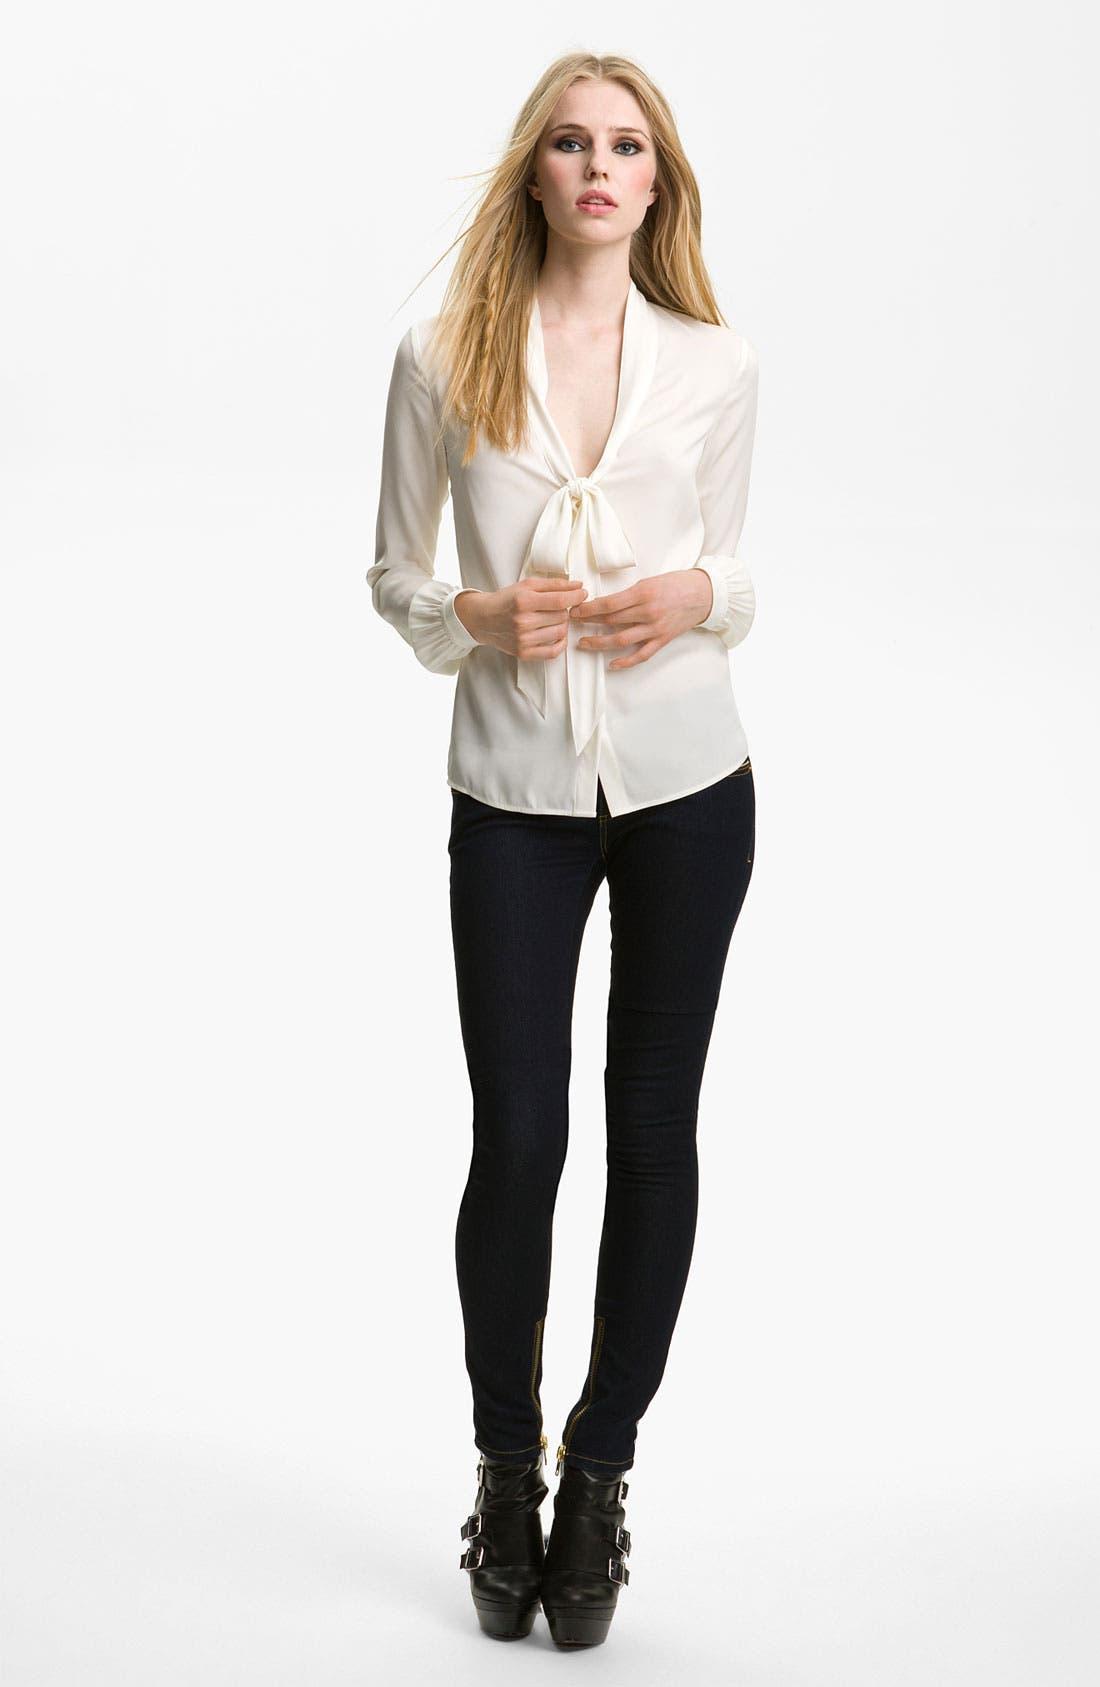 Alternate Image 1 Selected - Rachel Zoe 'Nathalie' Scarf Collar Top